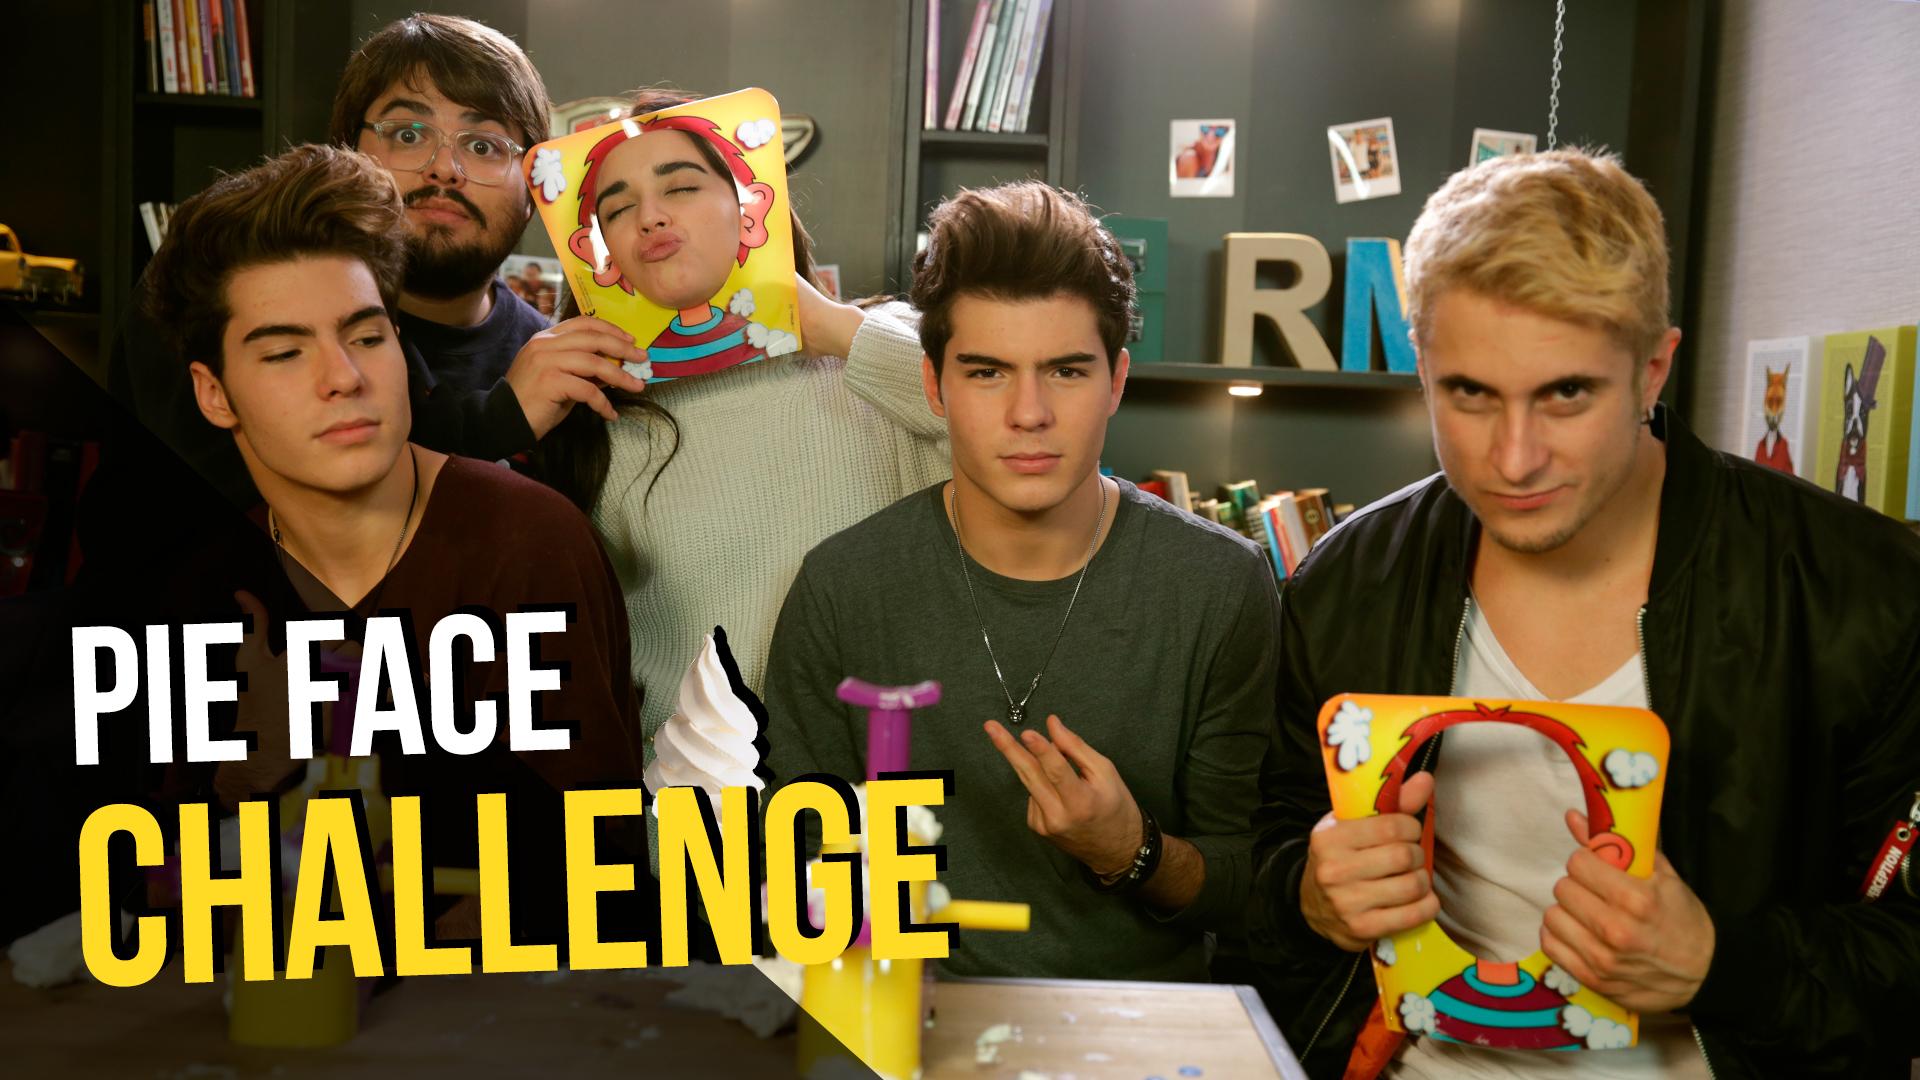 Temporada 1 'Pie Face Challenge' con Gemeliers